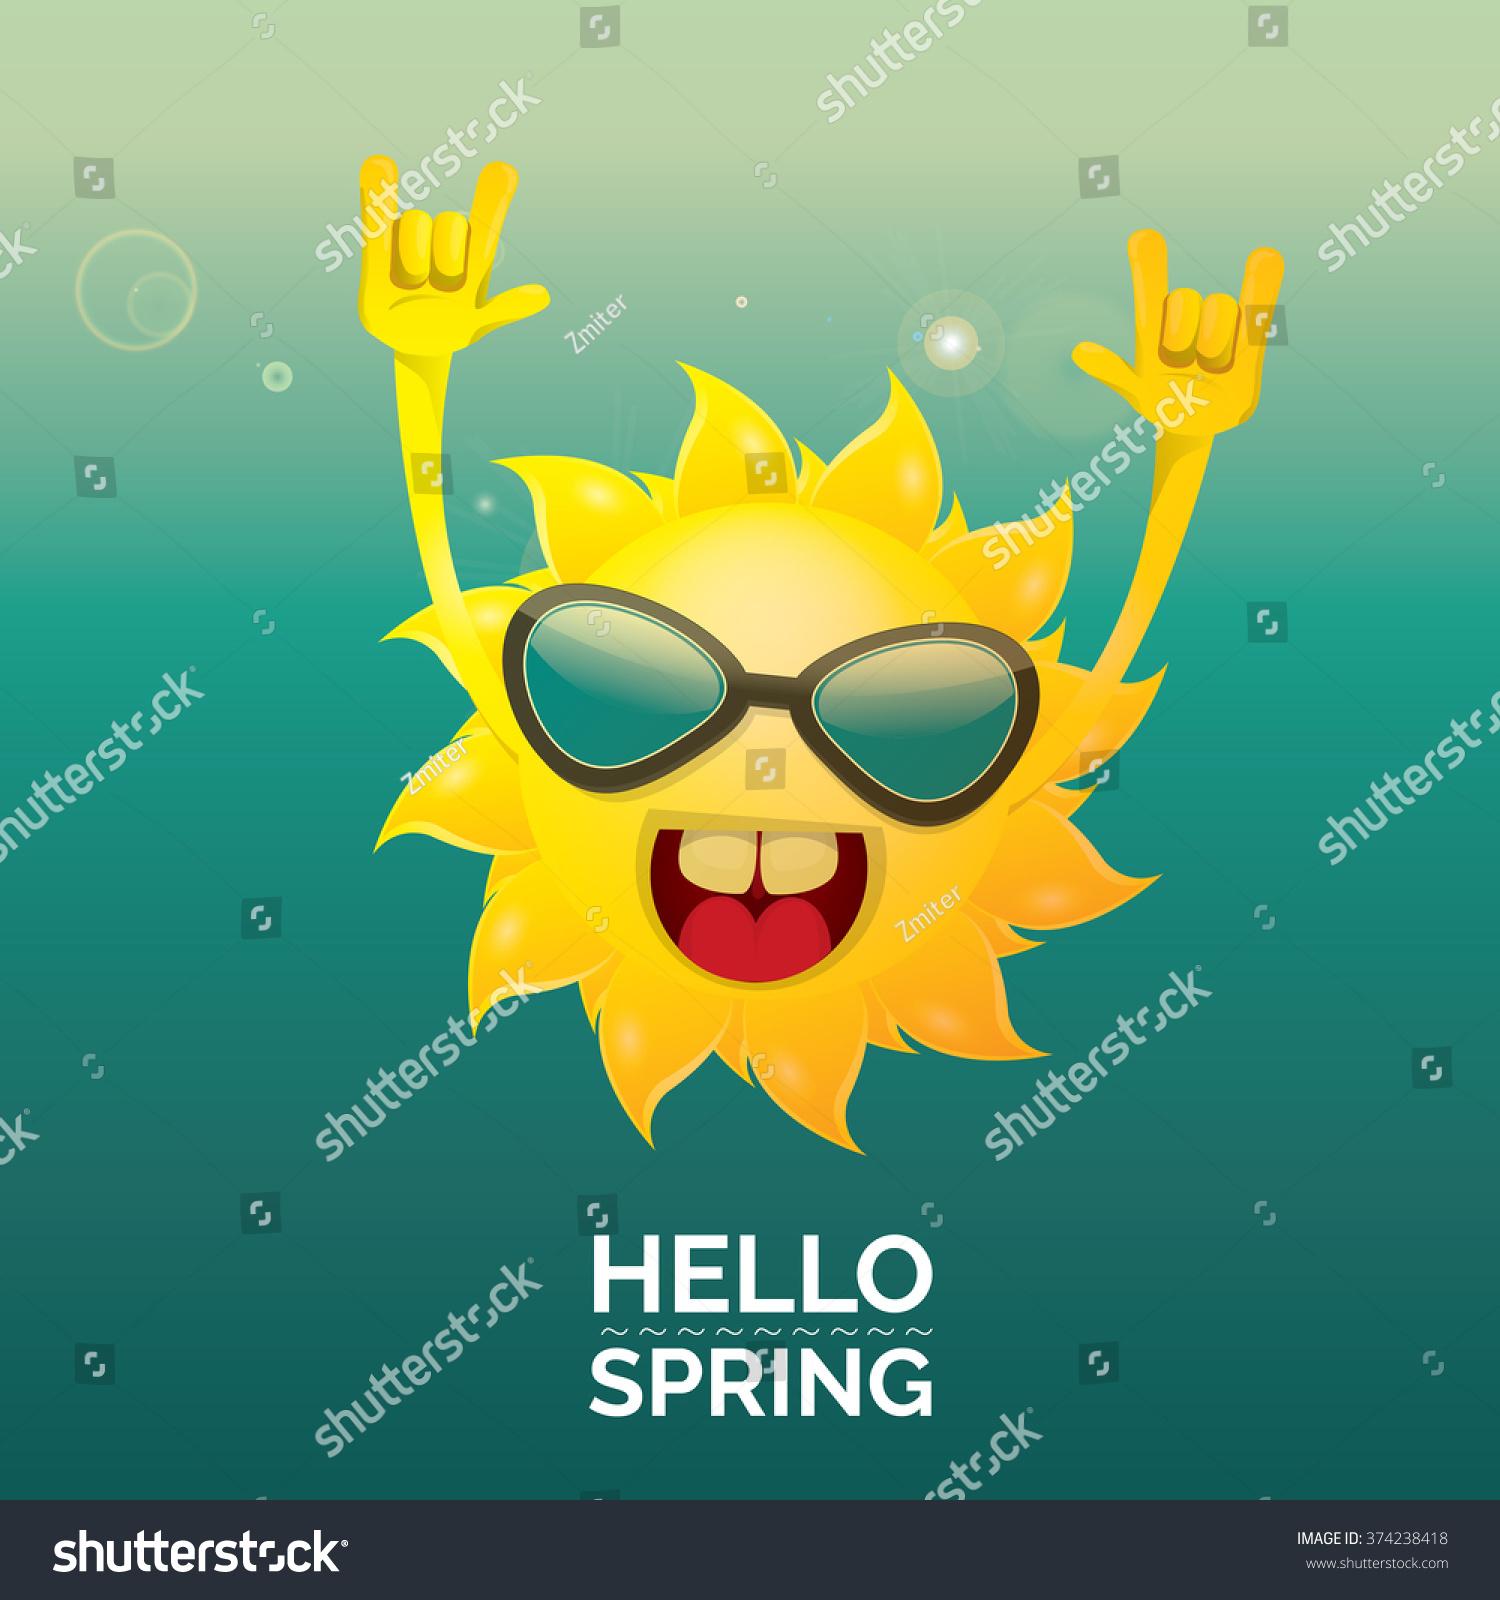 Rock n roll poster design - Sun Hand Rock N Roll Icon Vector Illustration Hello Spring Or Summer Rock Concert Poster